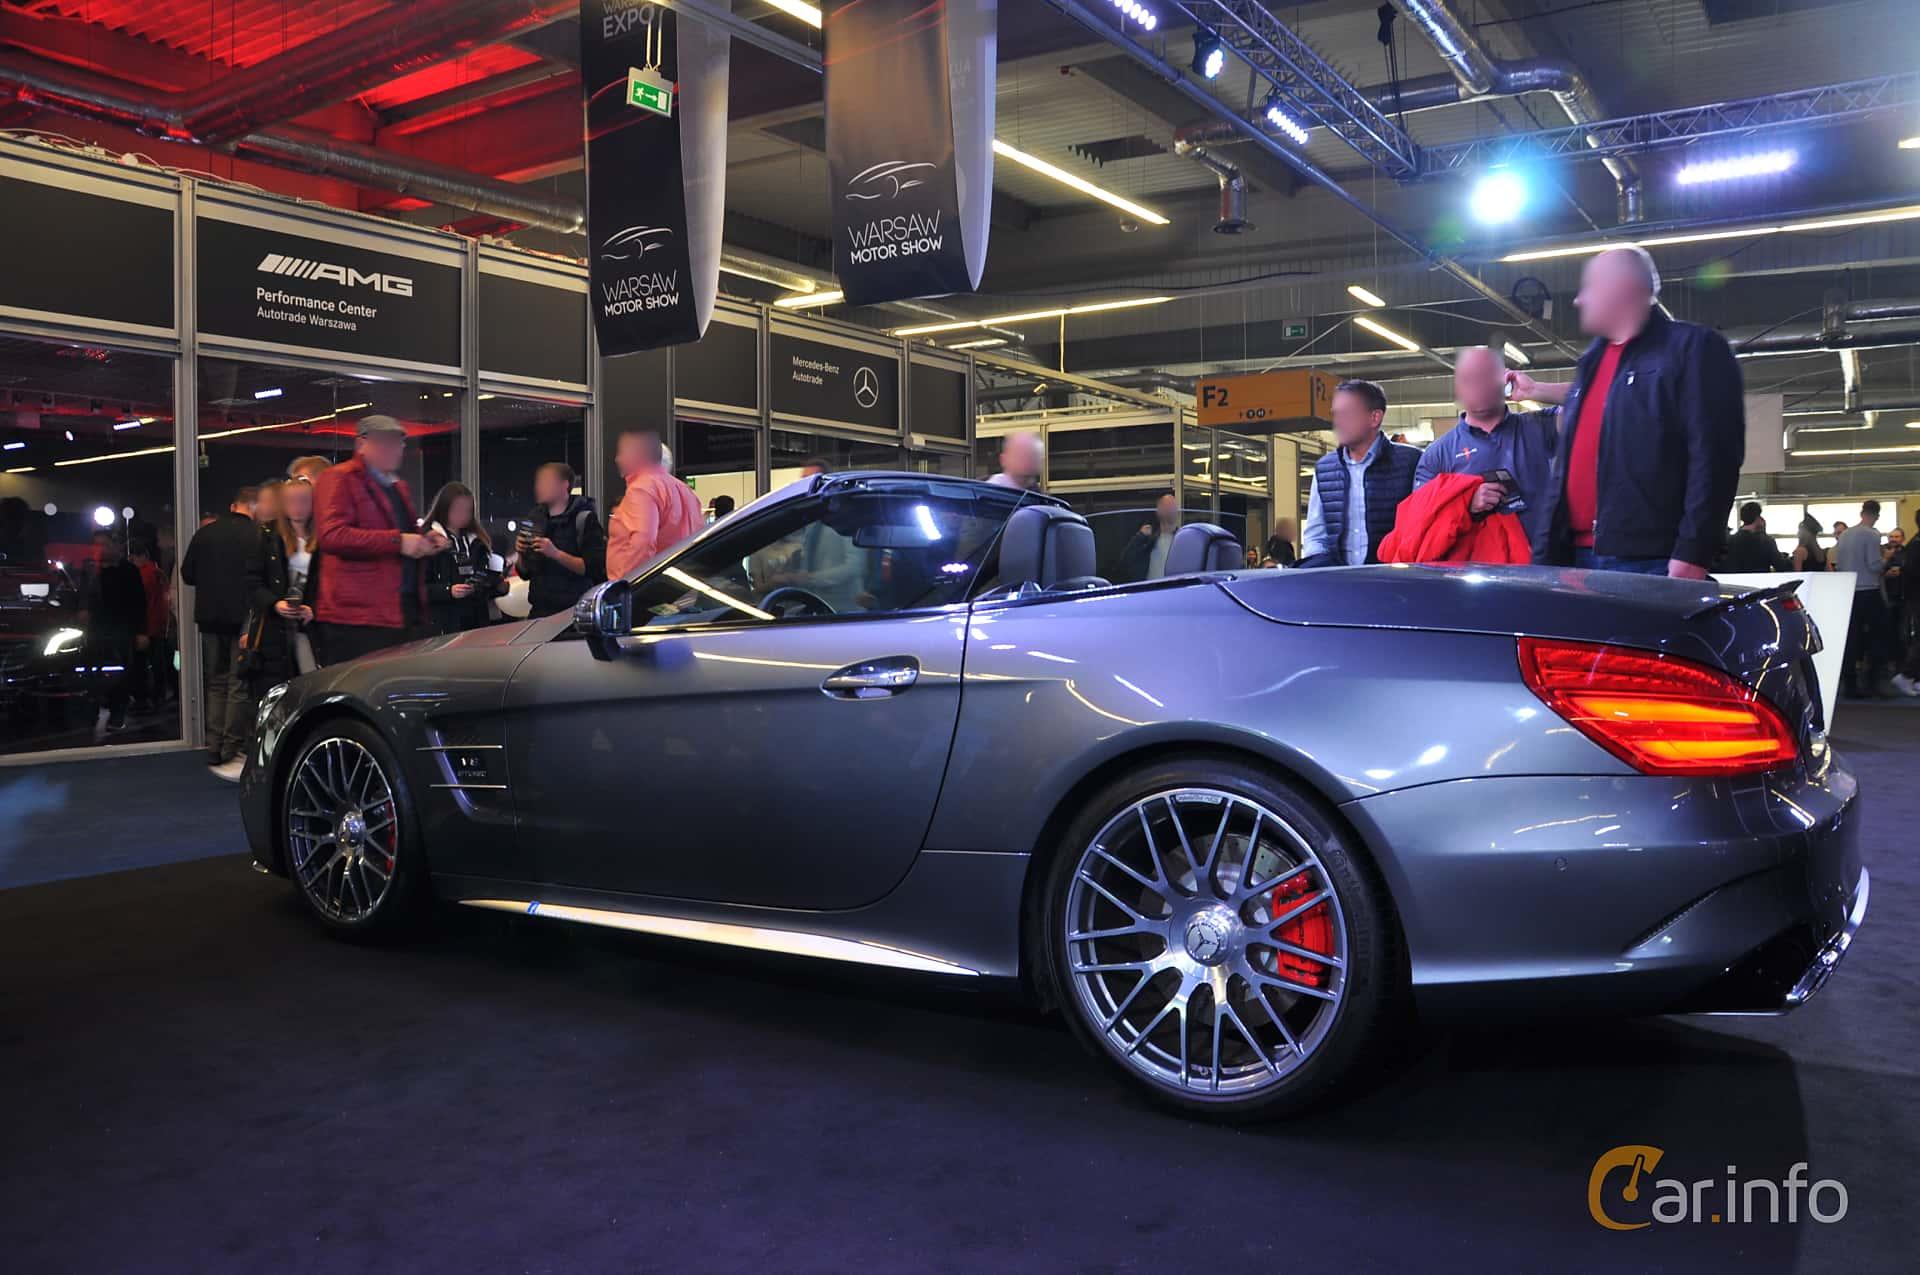 Mercedes-Benz SL 63 AMG  , 585hp, 2018 at Warsawa Motorshow 2018